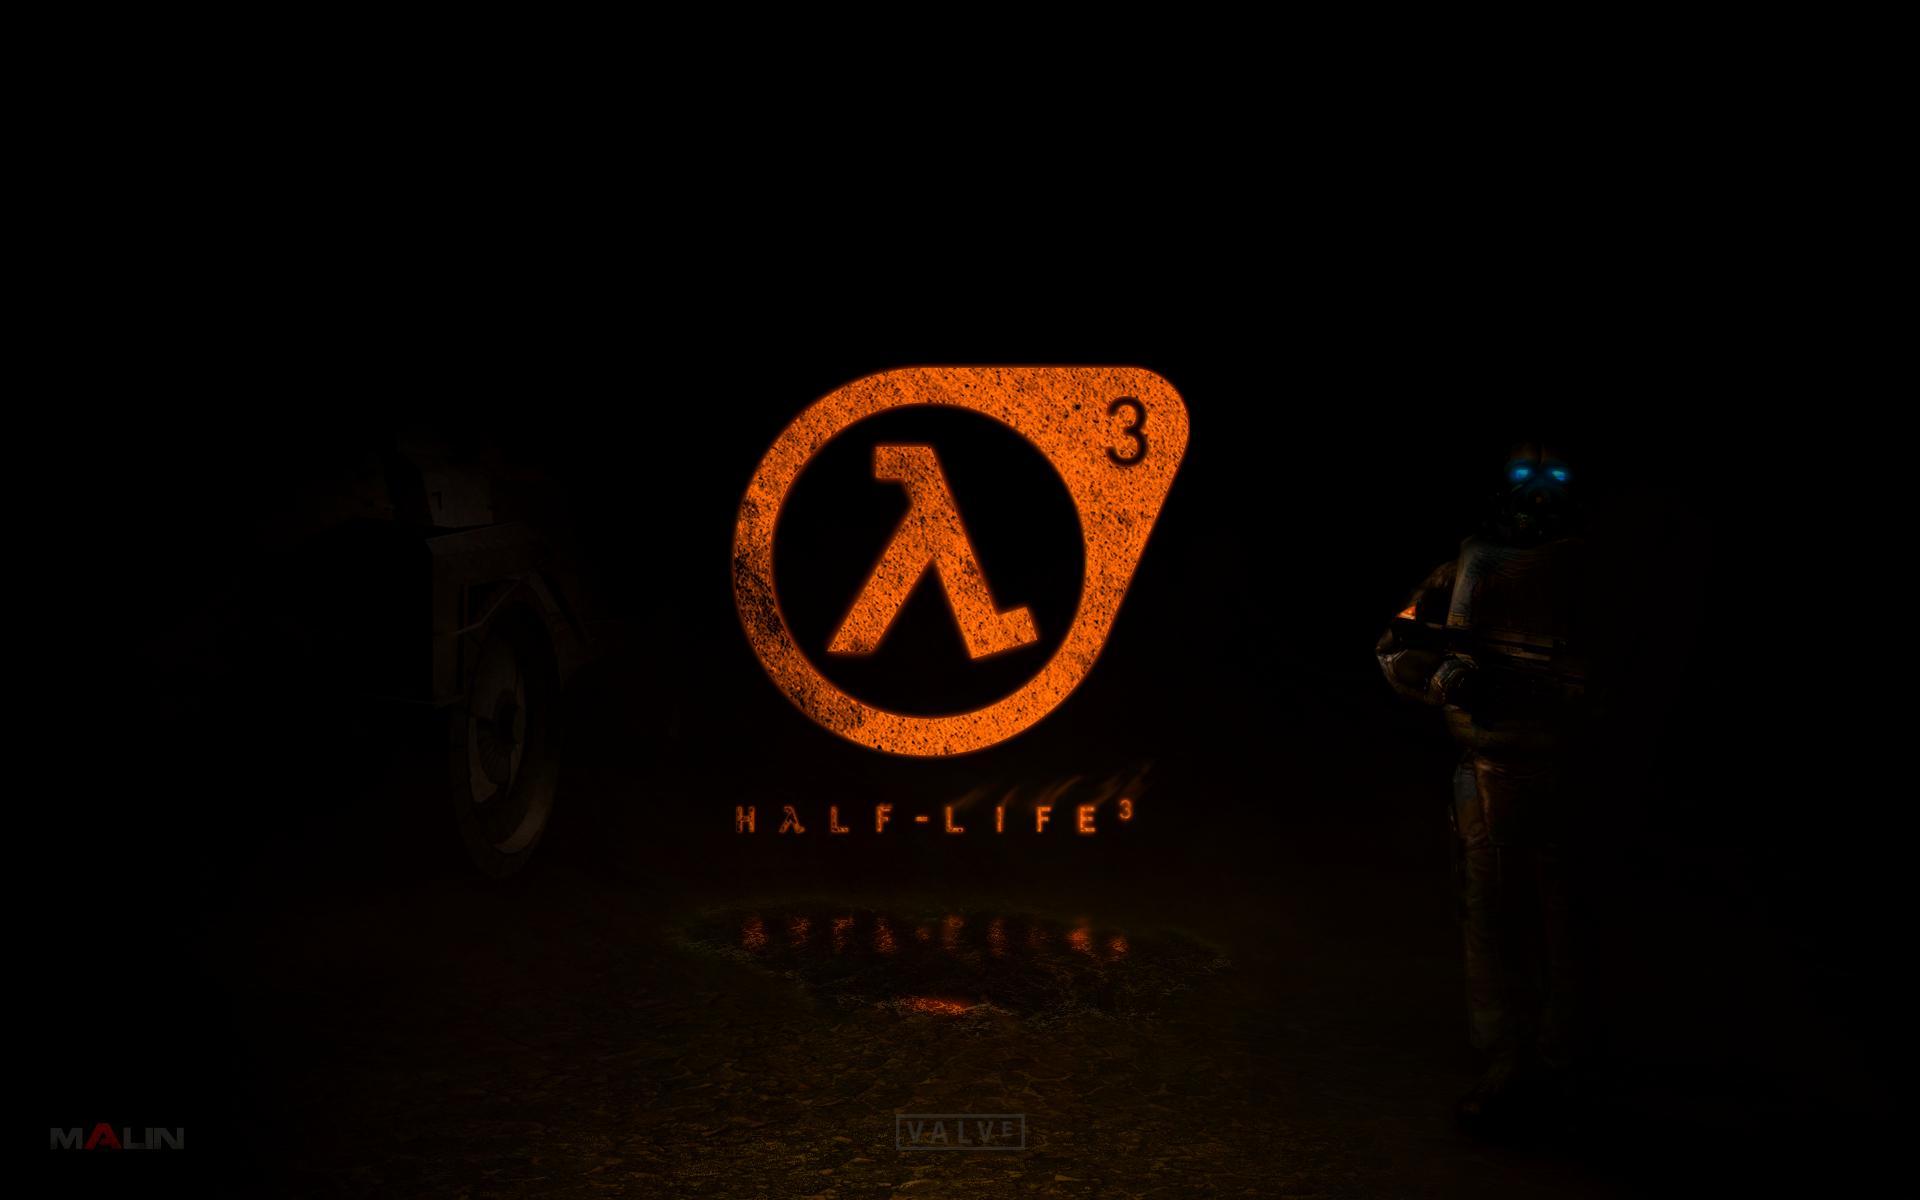 Half-Life 3 Logo with Combine 16:10 wallpaper